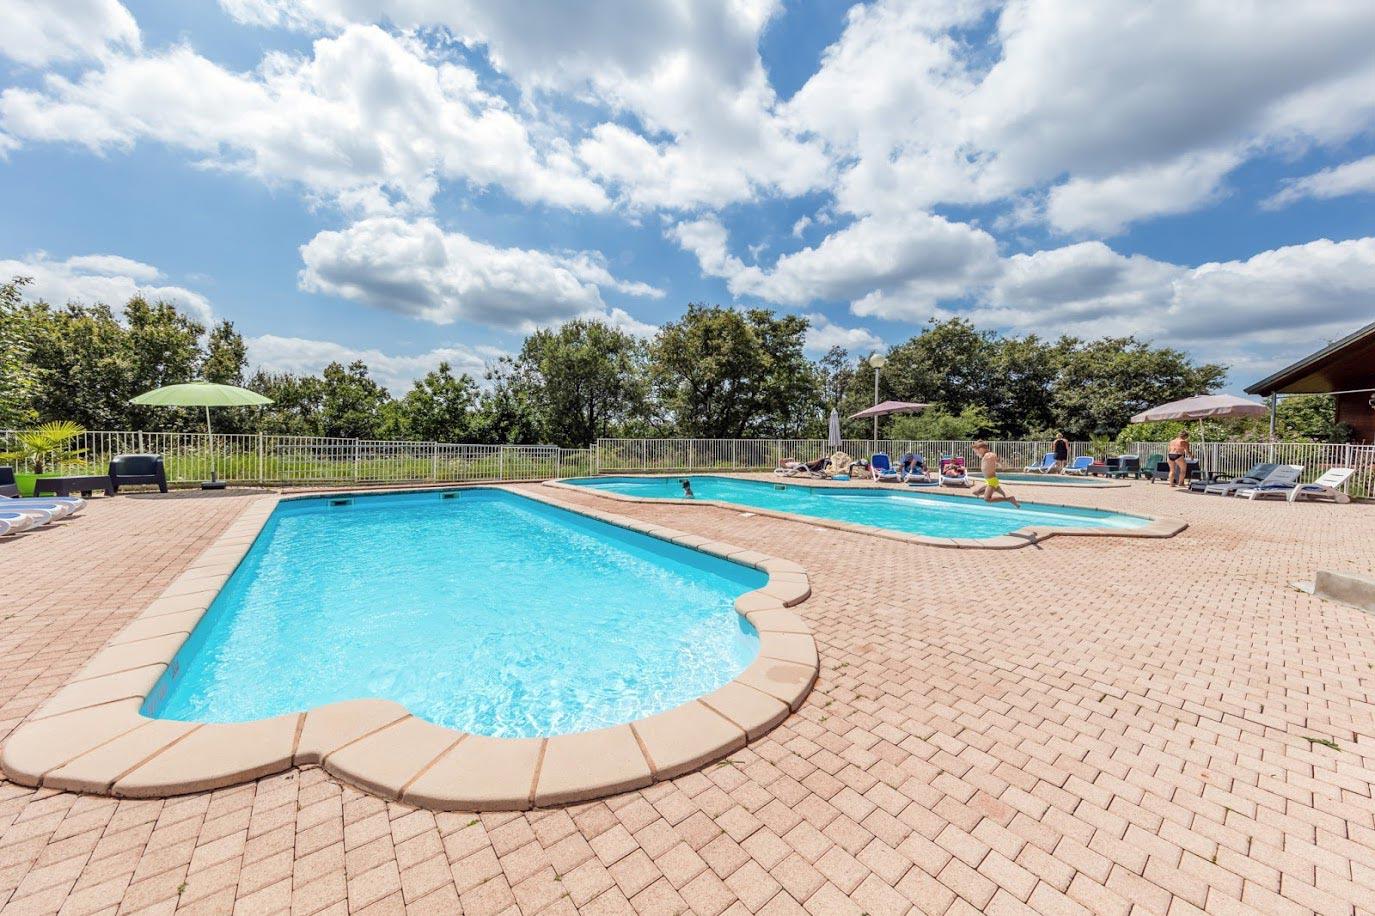 Camping gorges du tarn avec piscine vid o les gorges du for Camping dans les vosges avec piscine